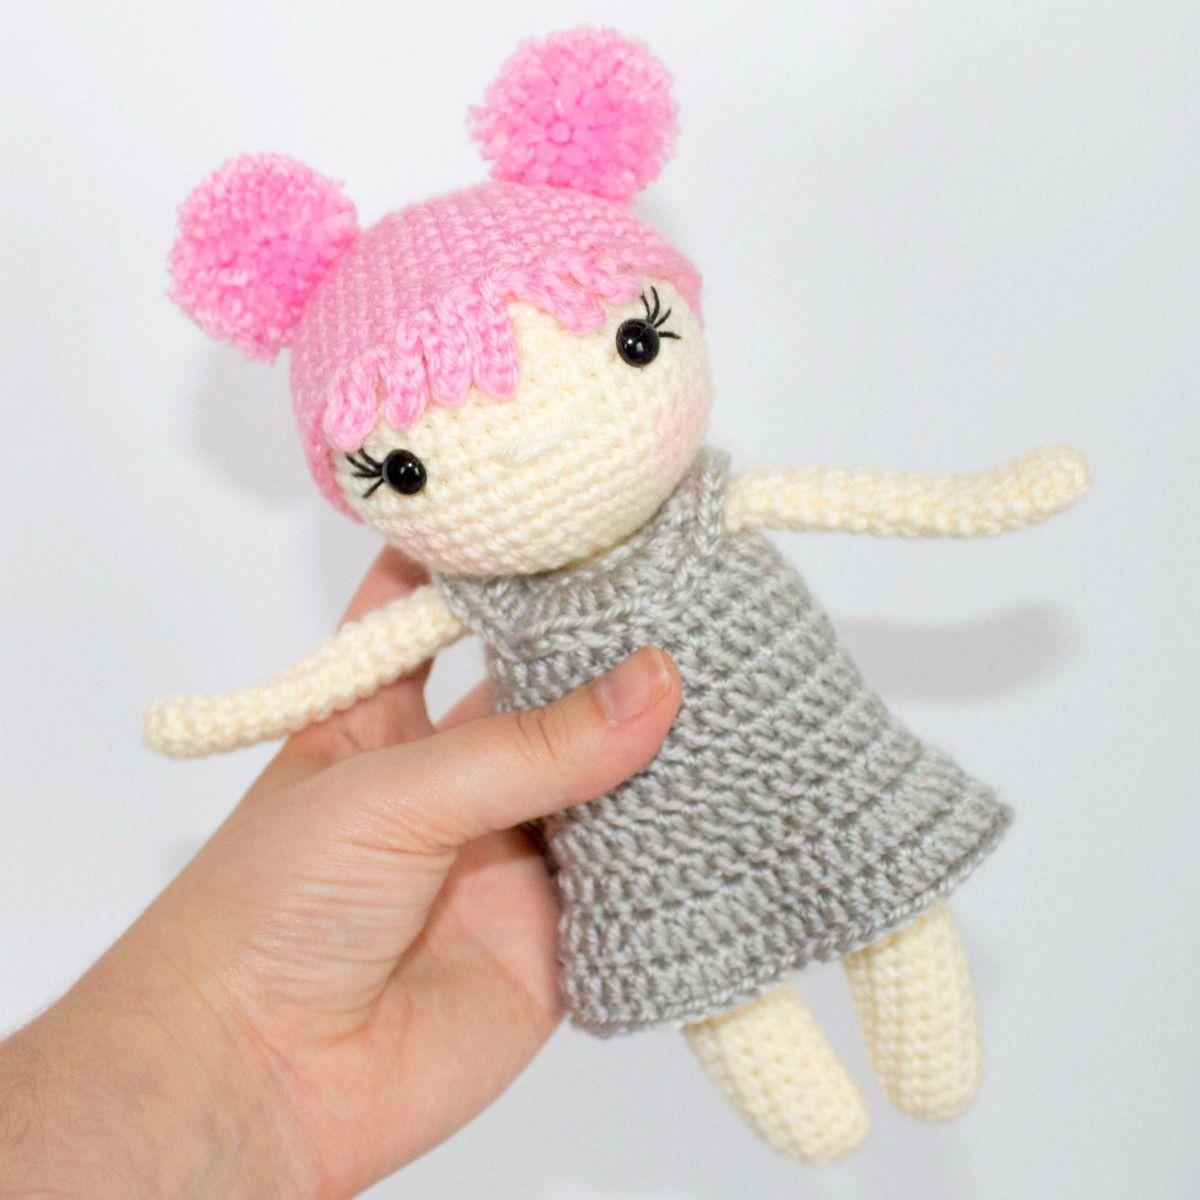 Free Crochet Doll Pattern- The Friendly Zoey | Muñecas, Ganchillo y ...